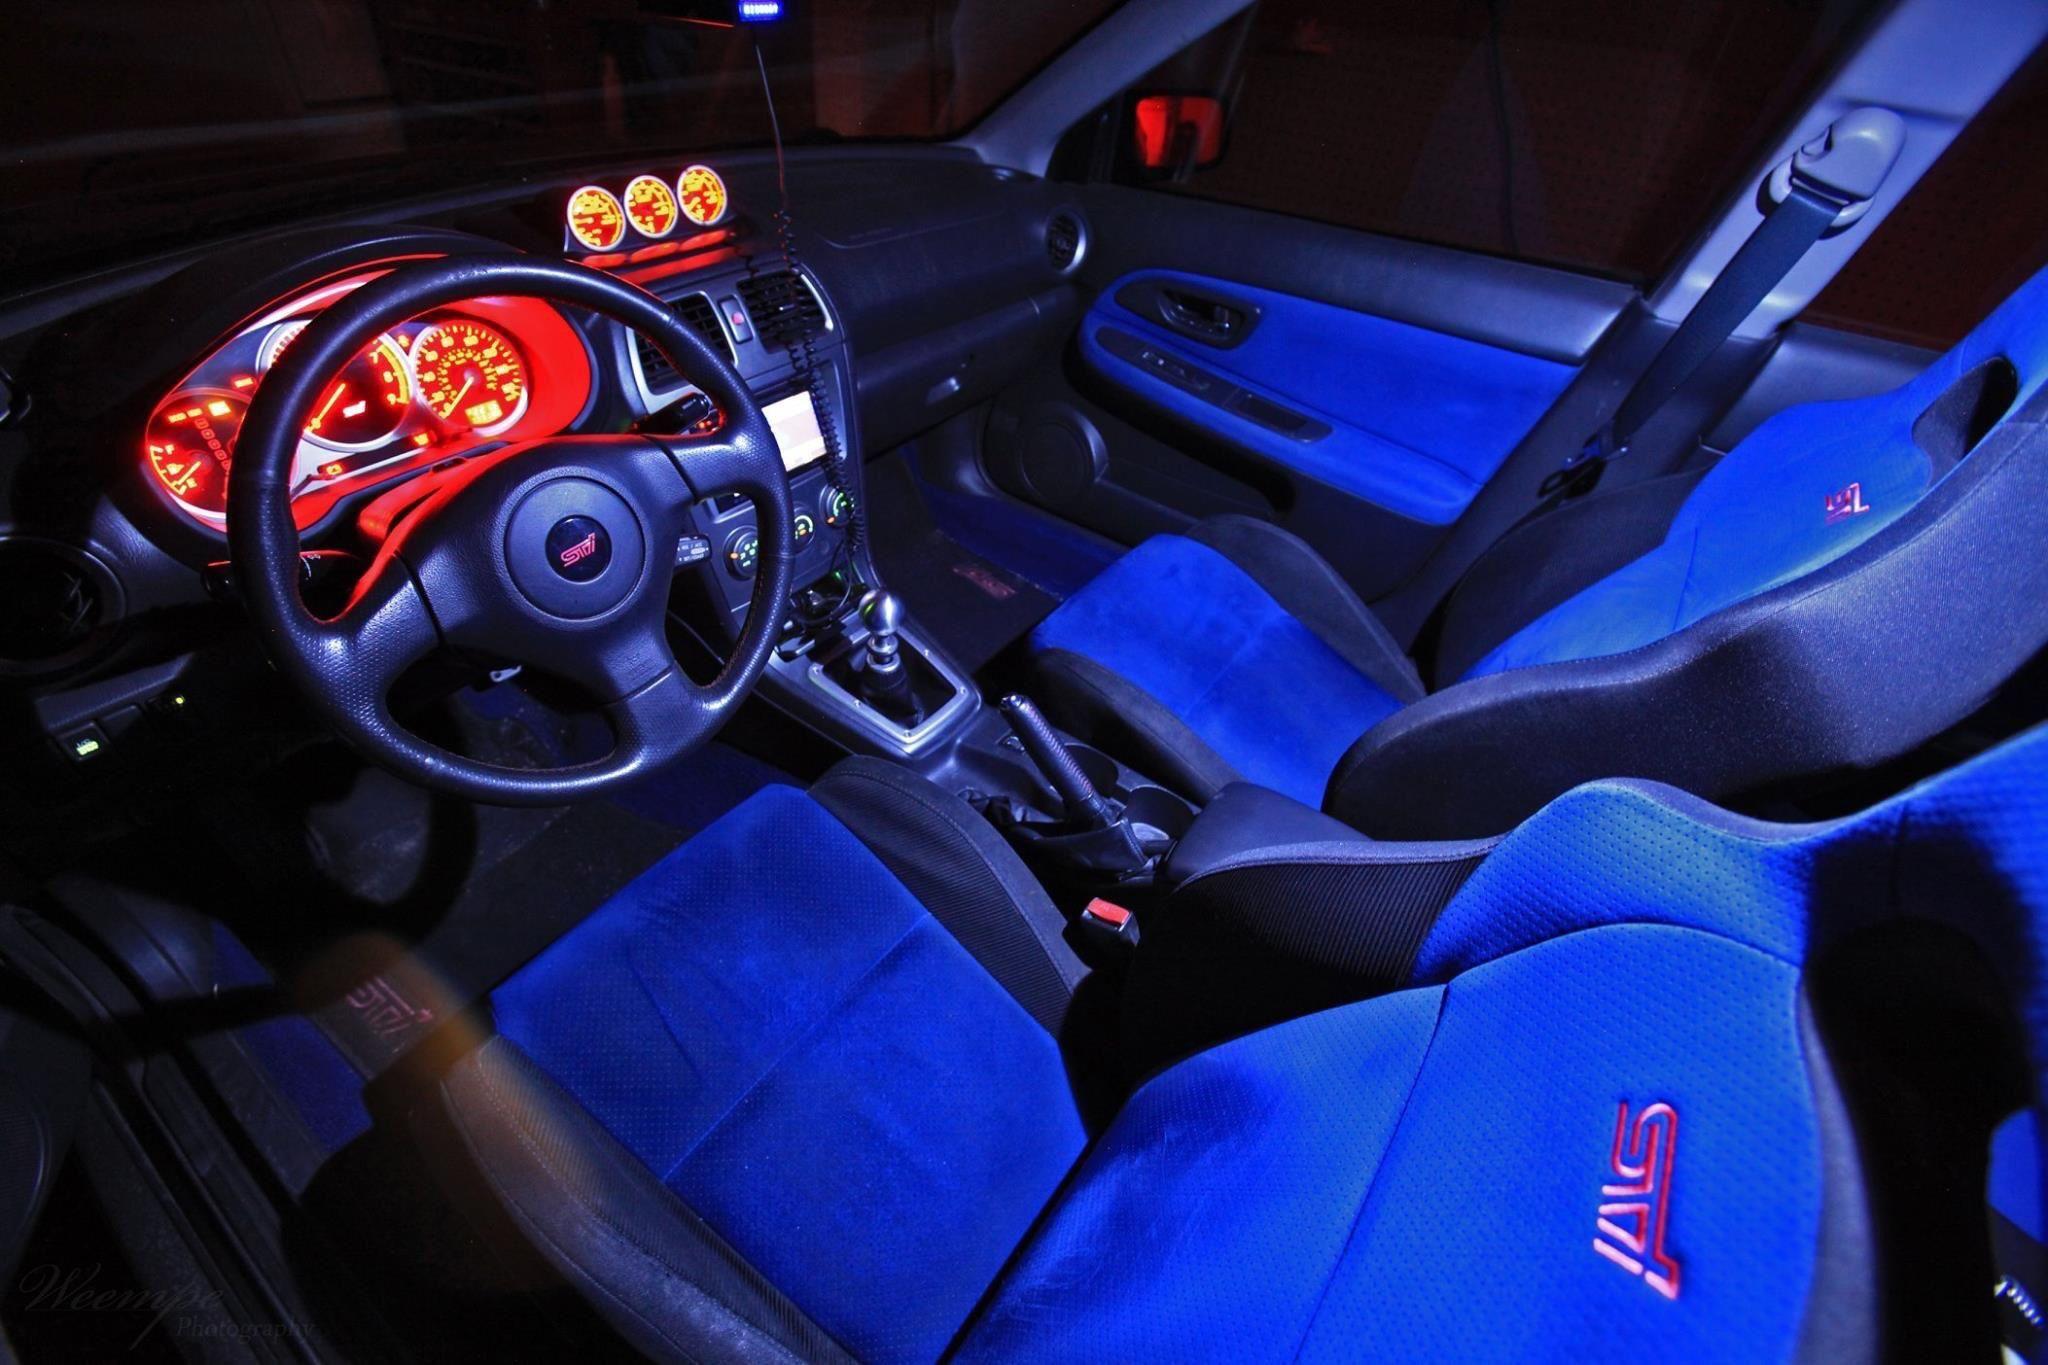 2005 Sti Interior Subaru Wrx Sti Impreza Forester Subie Subaru Impreza Sti Subaru Impreza Subaru